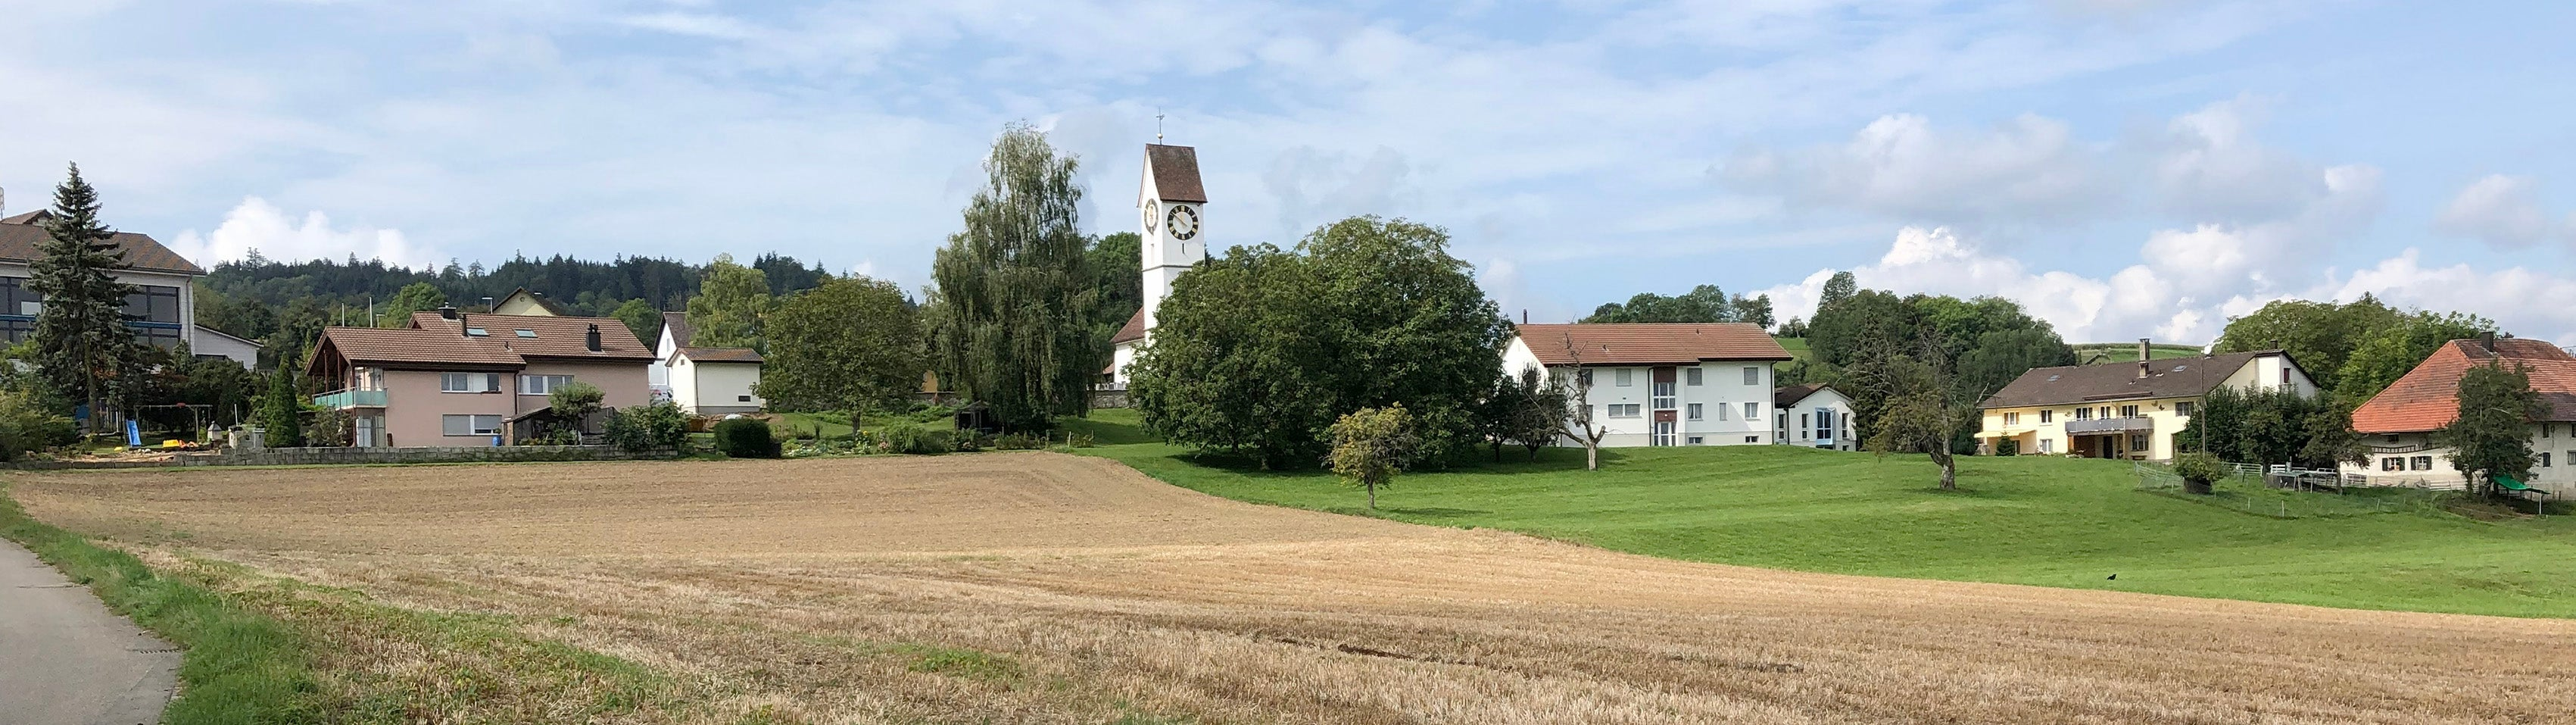 Leutwil